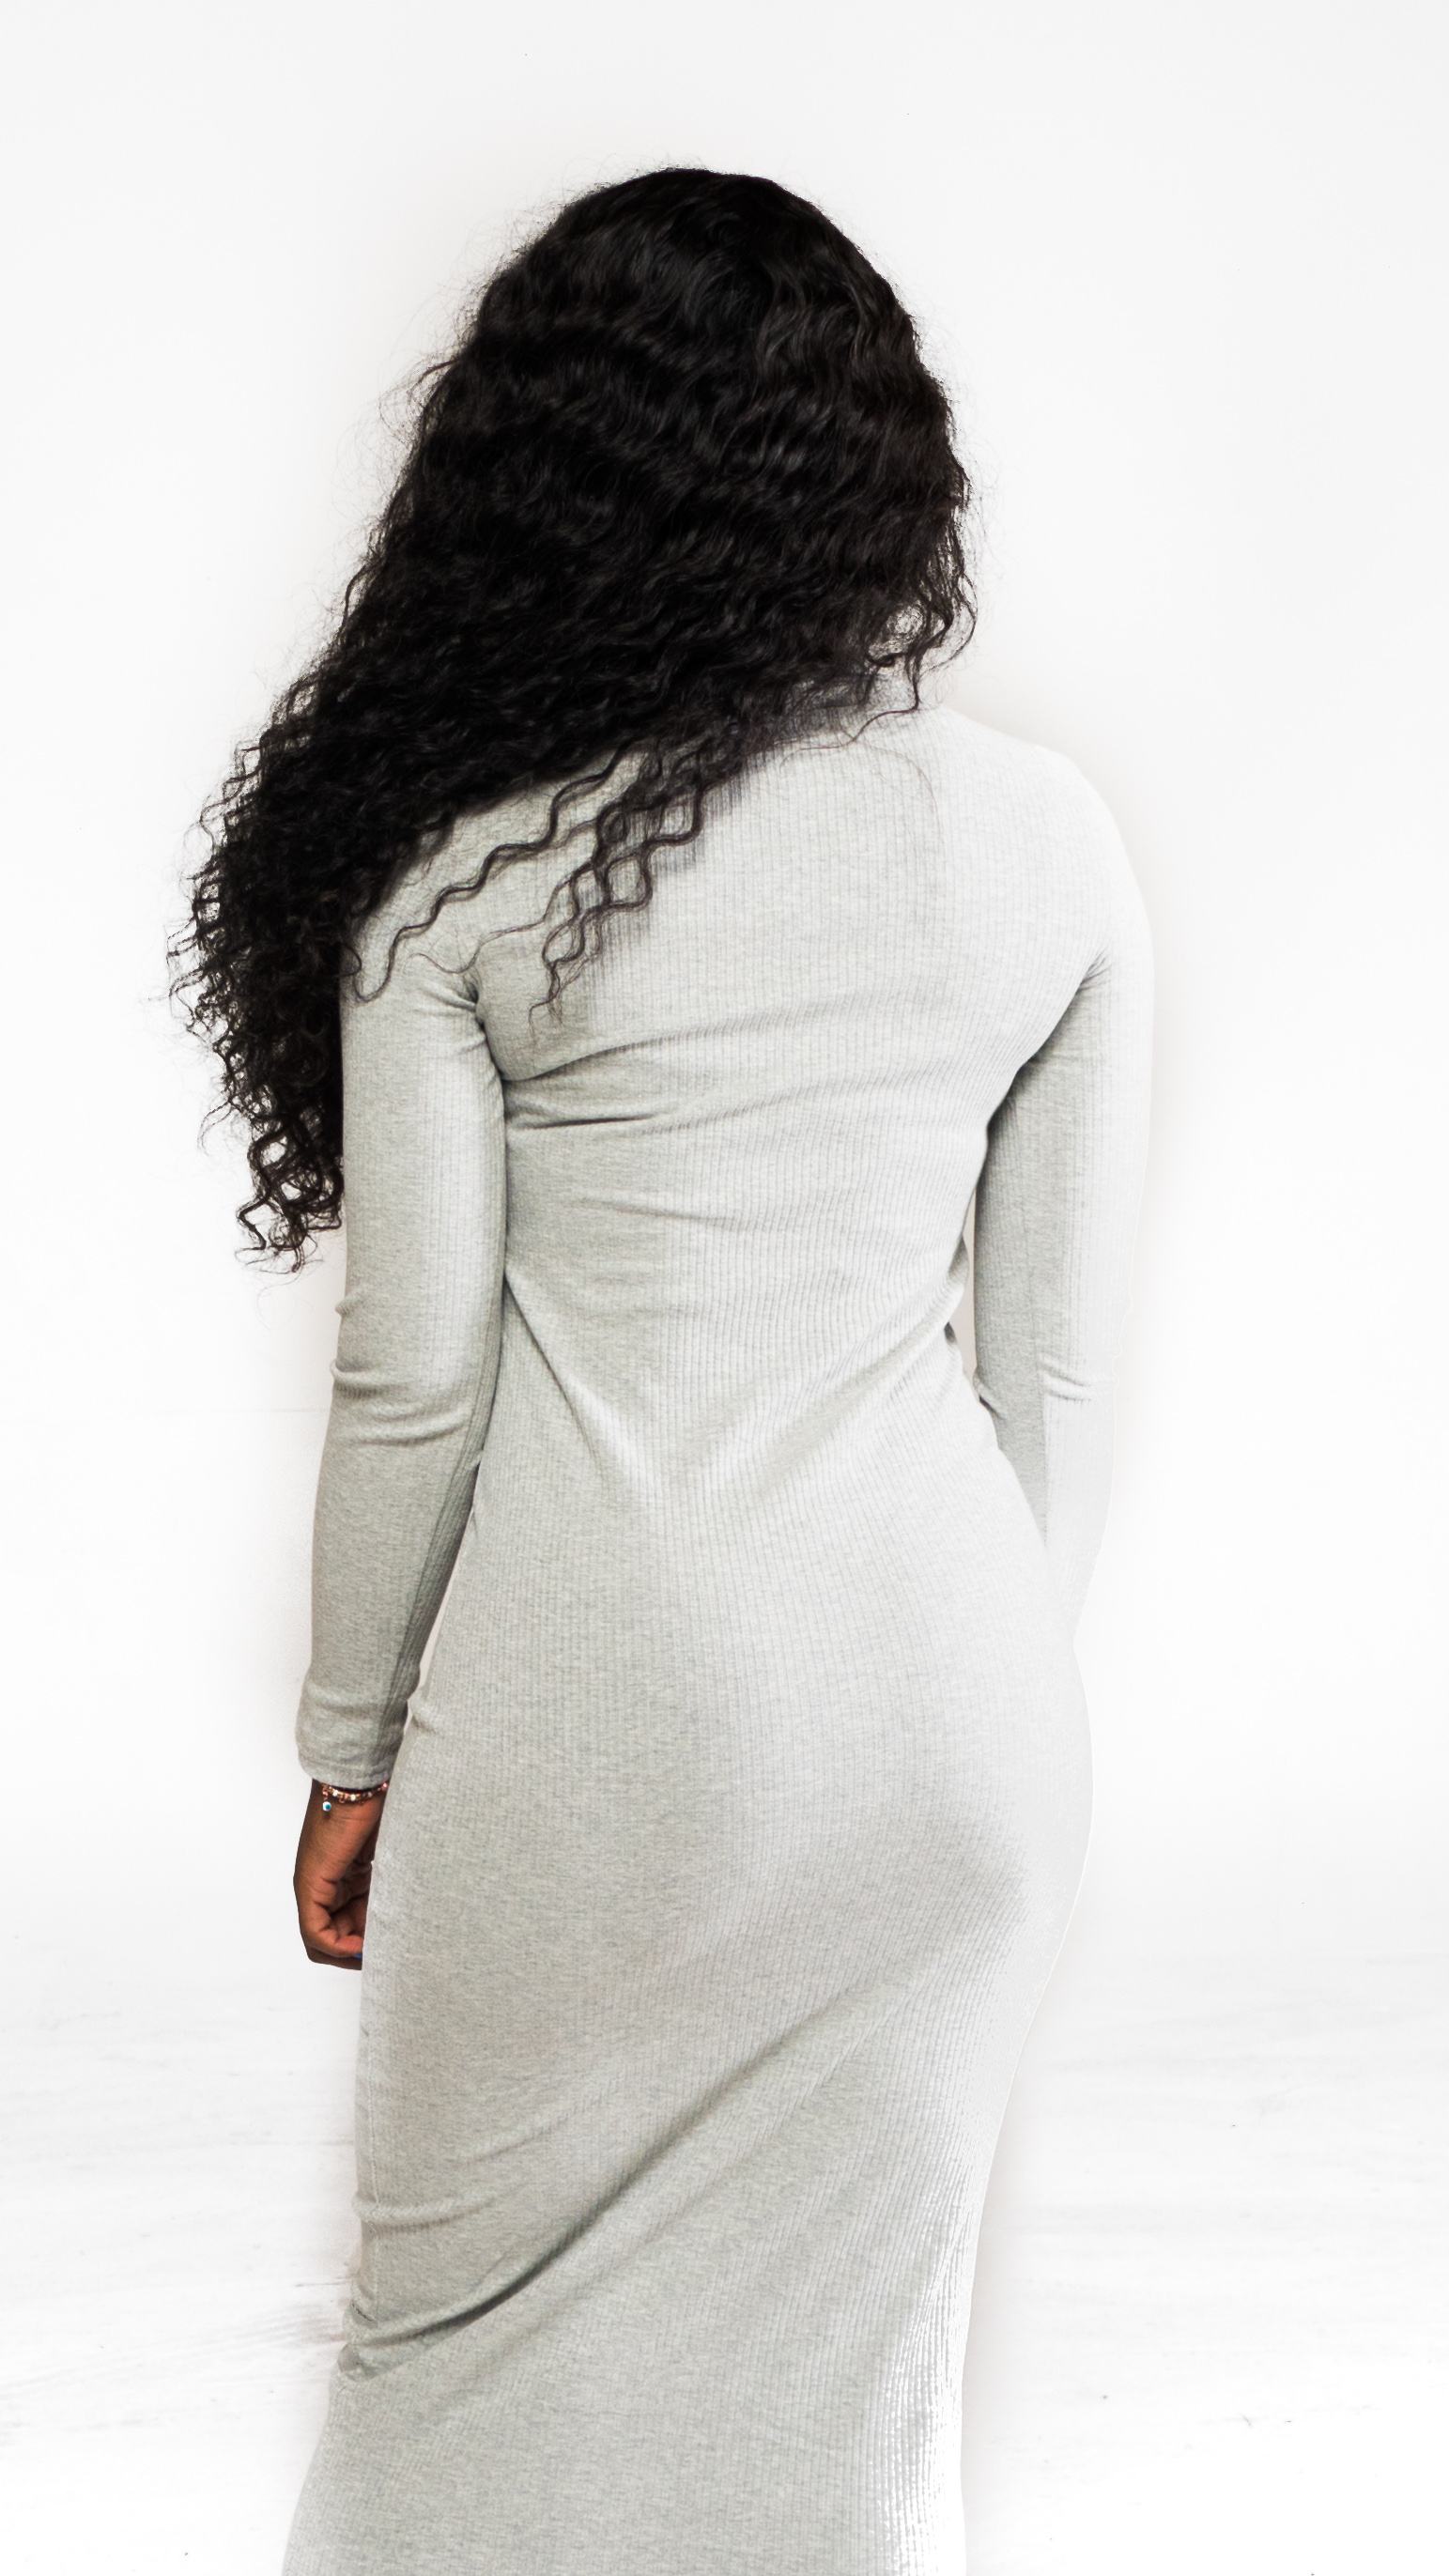 isis clothing - product shots-1580512.jpg